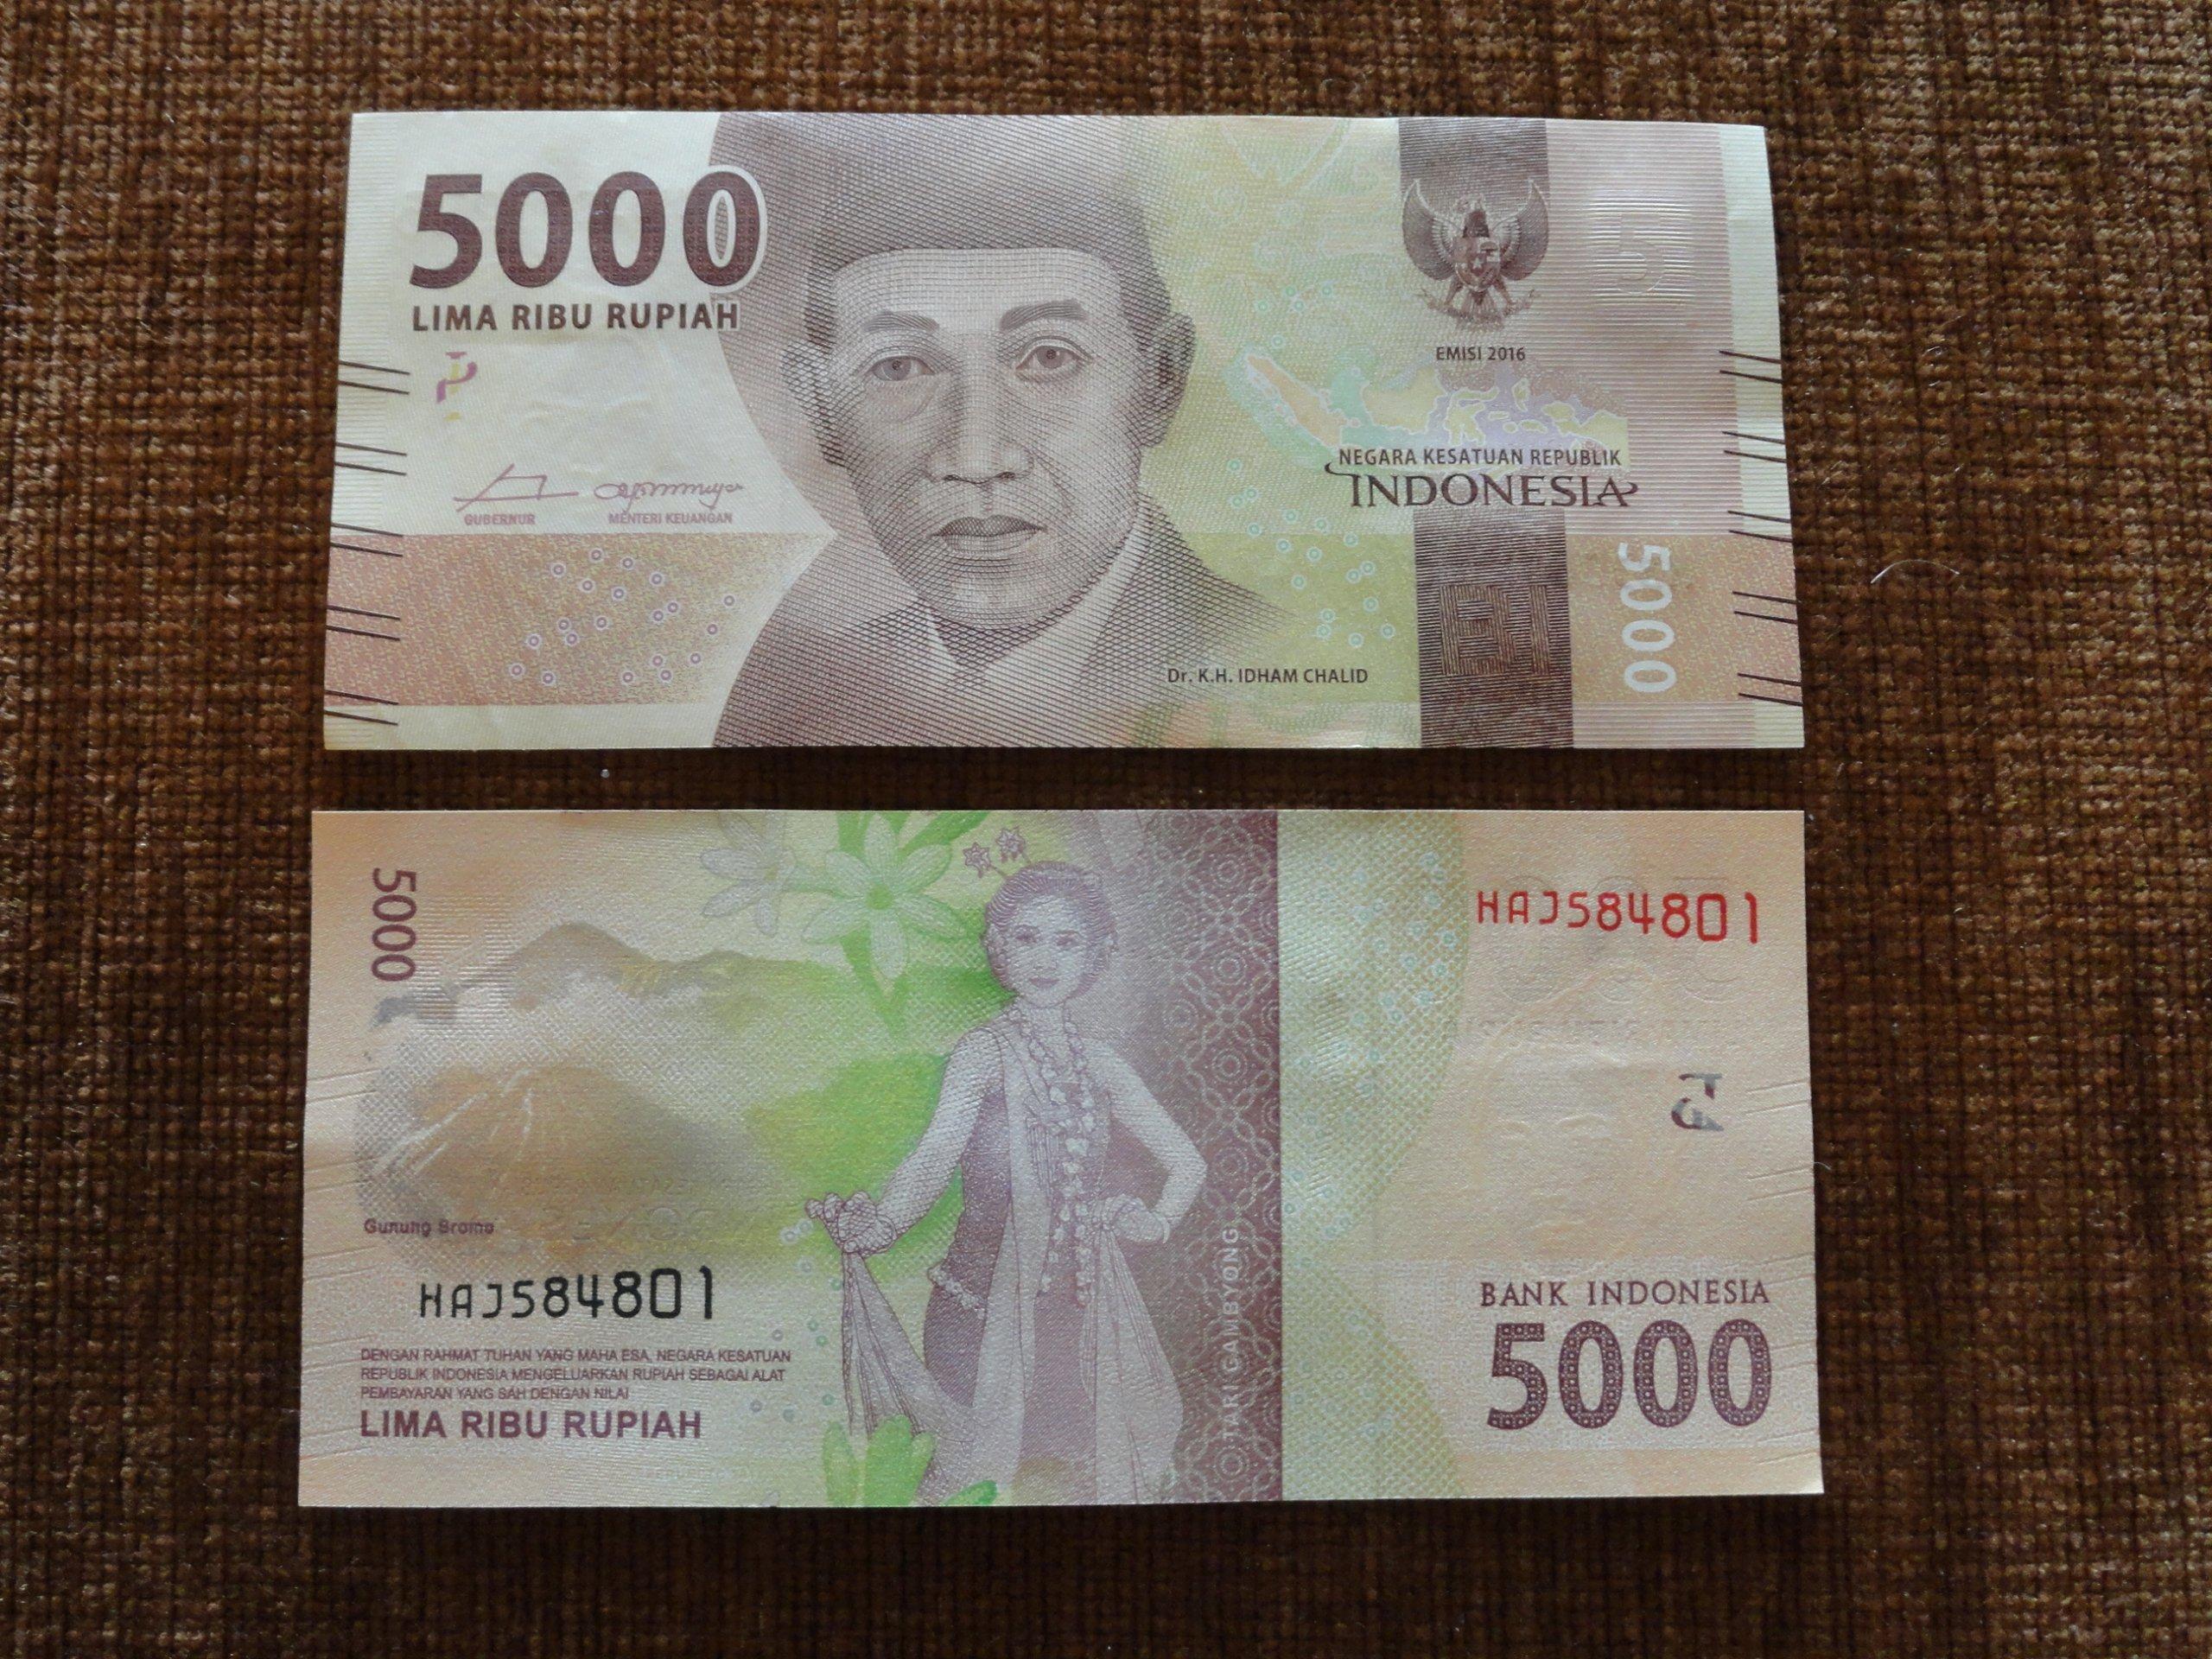 258 ИНДОНЕЗИЯ 5000 РУП UNC